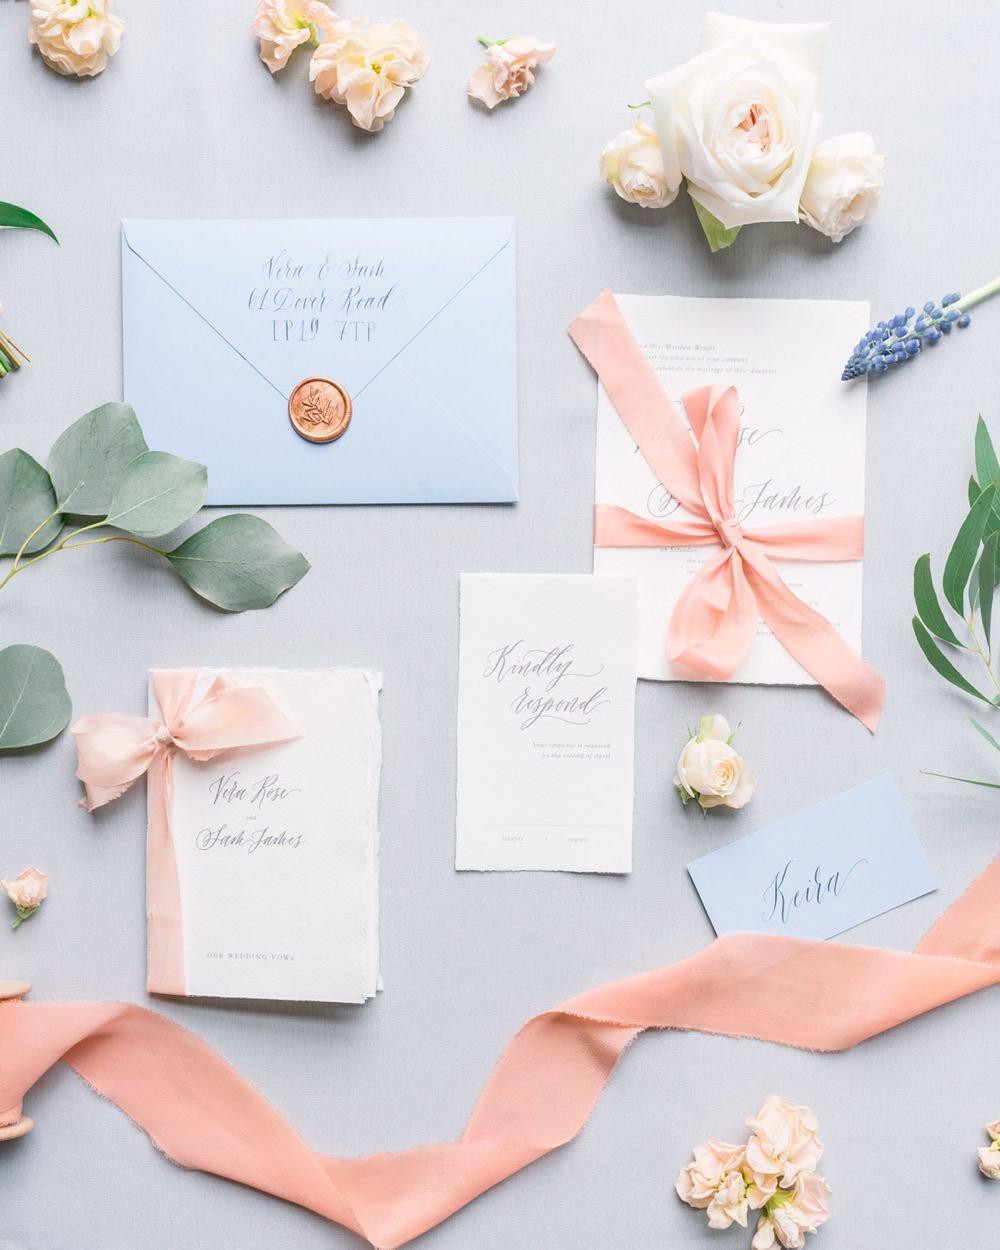 Pastel Pink Blue Stationery Invite Invitations Coral Peach Wax Seal Calligraphy Flat Lay Elegant Wedding Ideas Yll Weddings